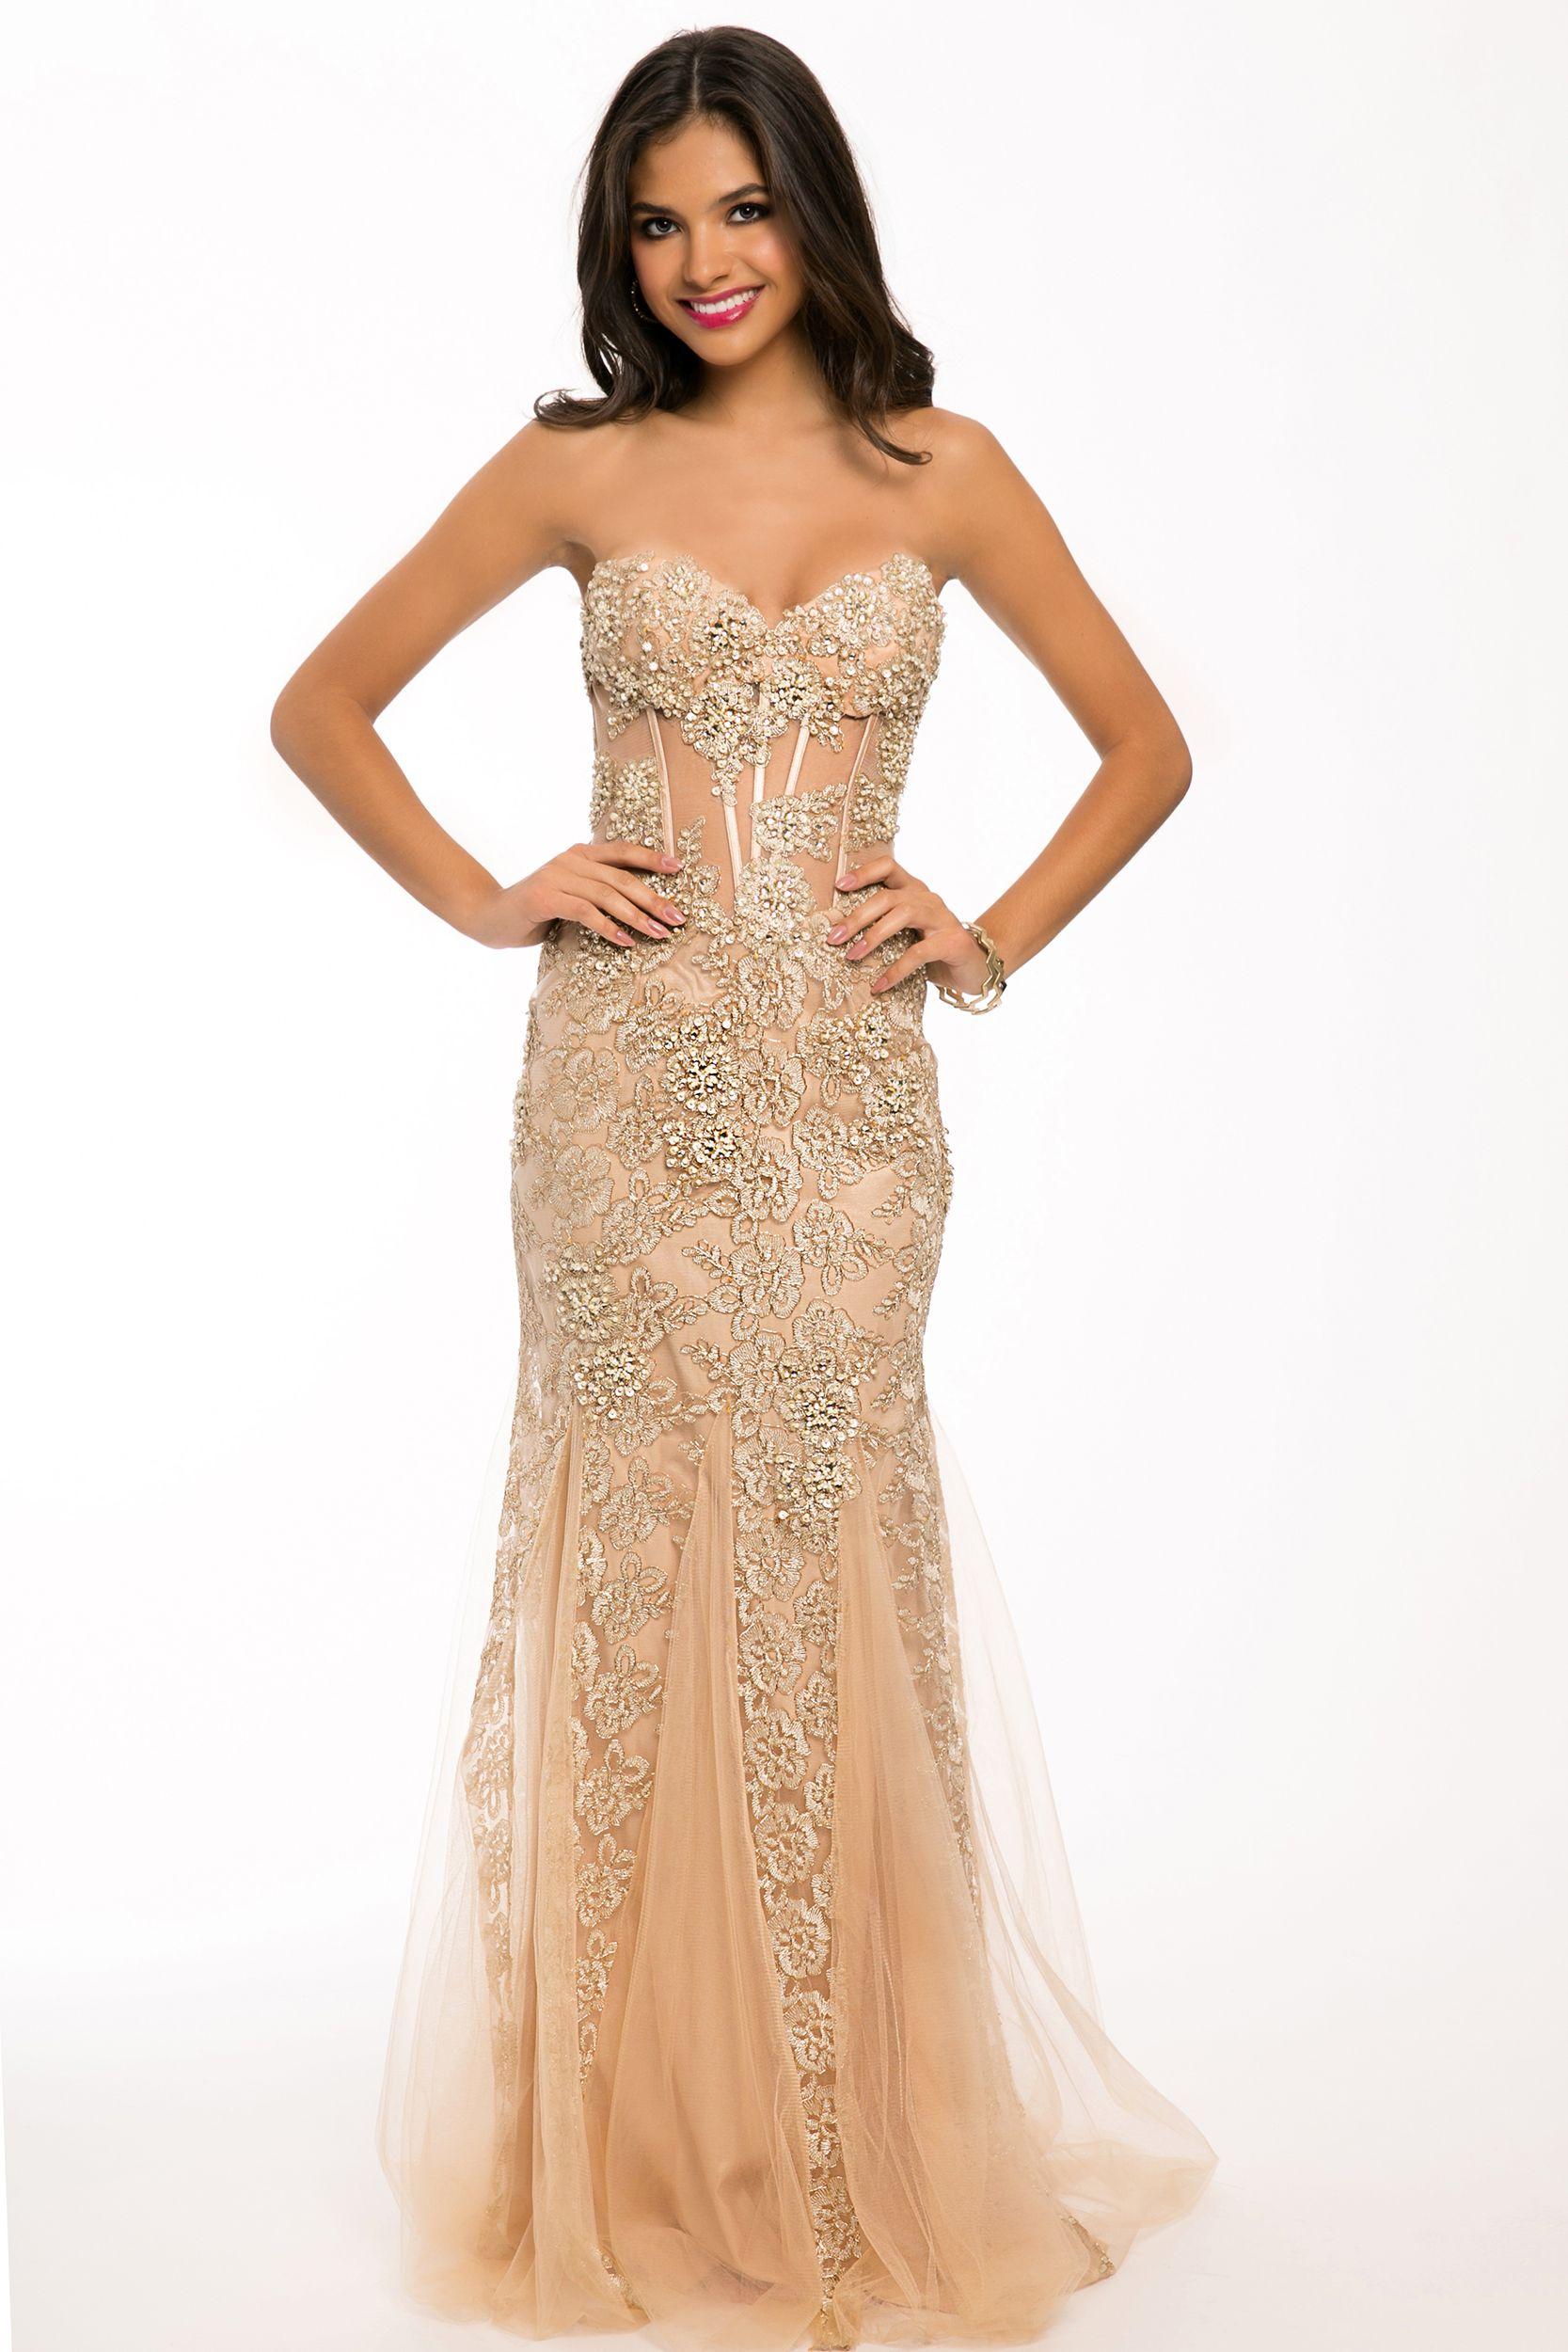 Prom Dresses for Petite Hourglass